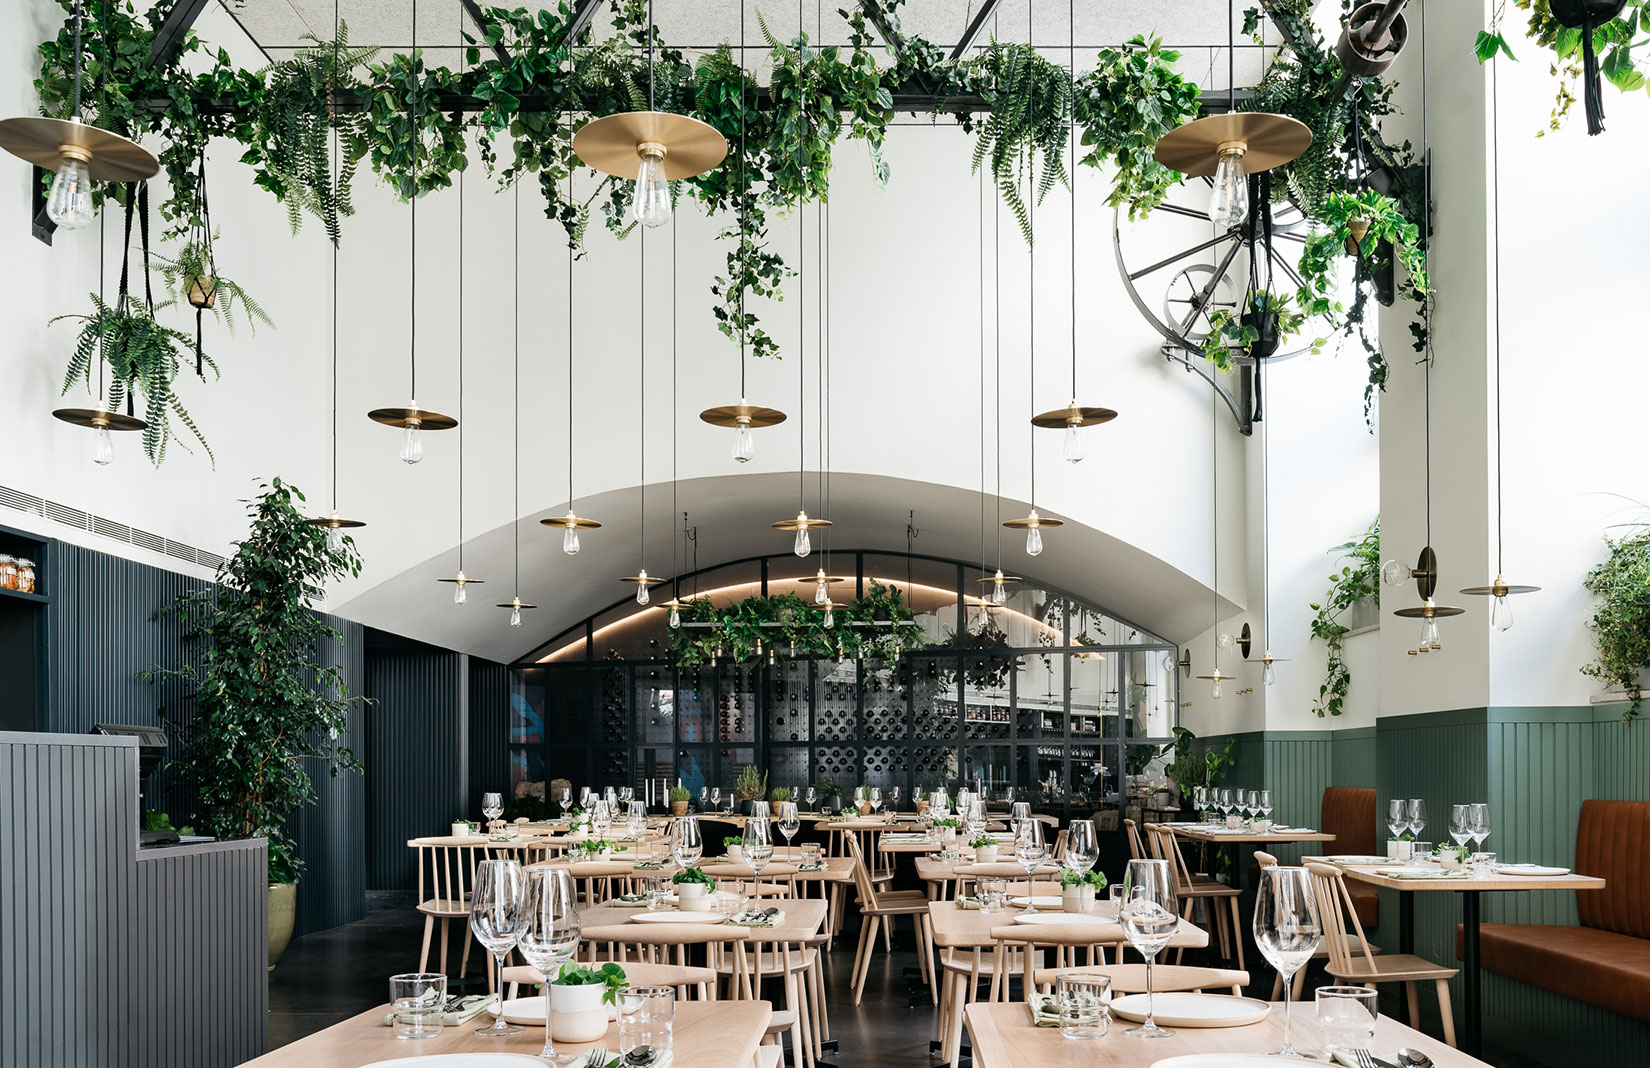 Prado restaurante Lisbon